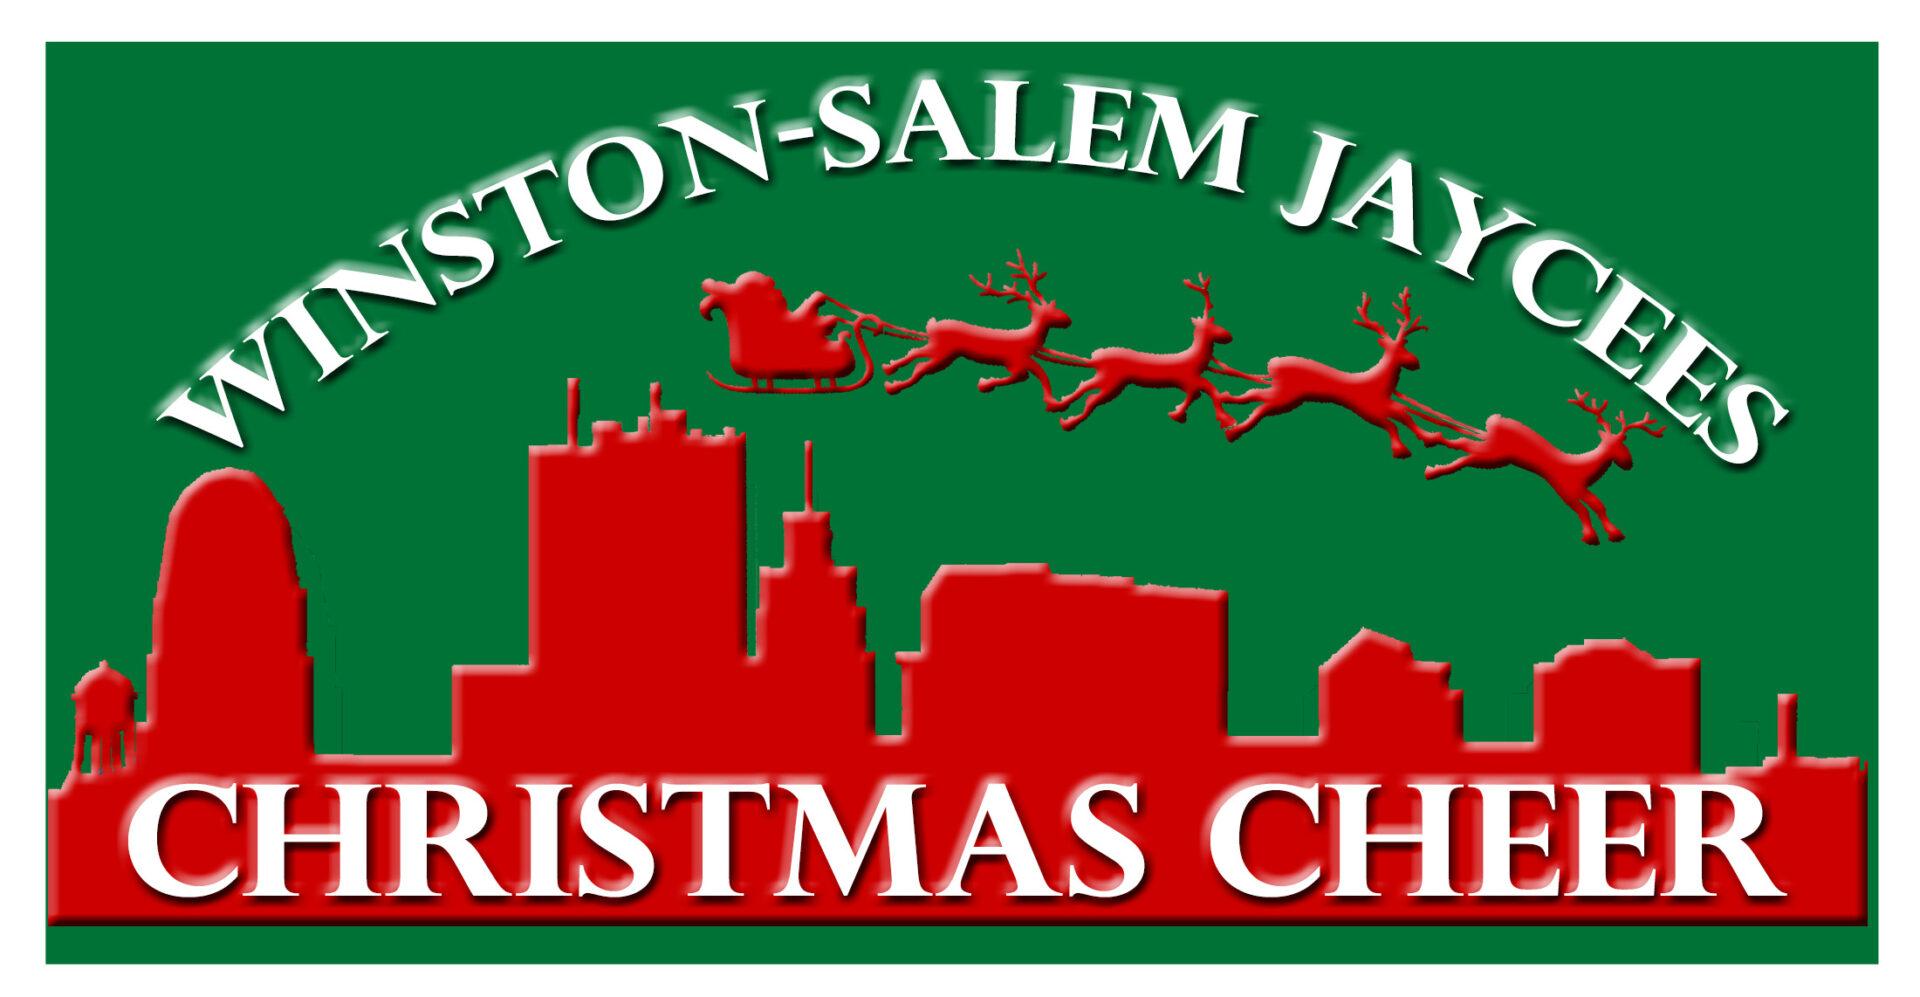 Winston-Salem Jaycees Christmas Cheer